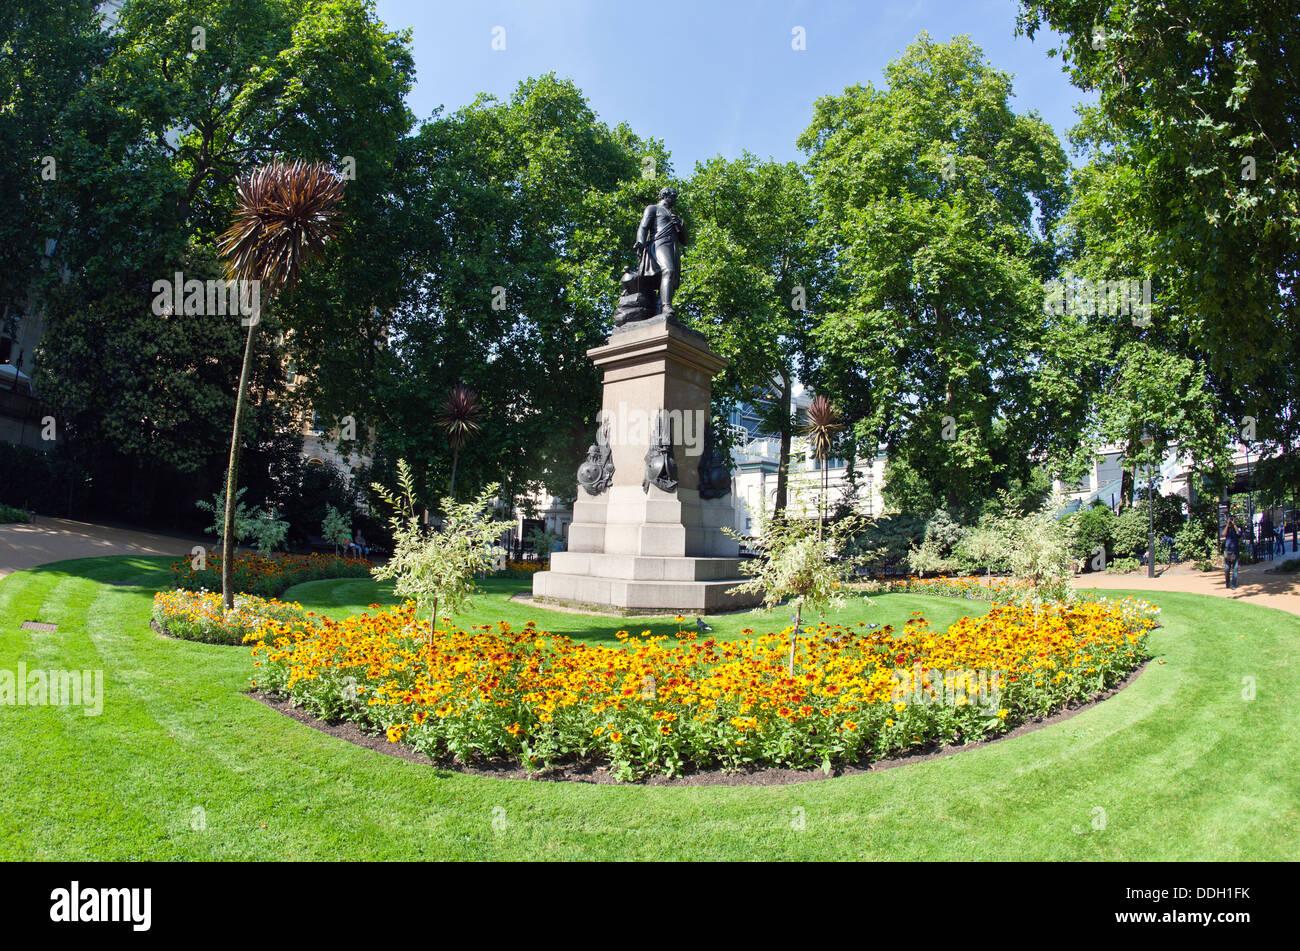 Victoria Embankment Gardens London Uk Stock Photo 59996039 Alamy